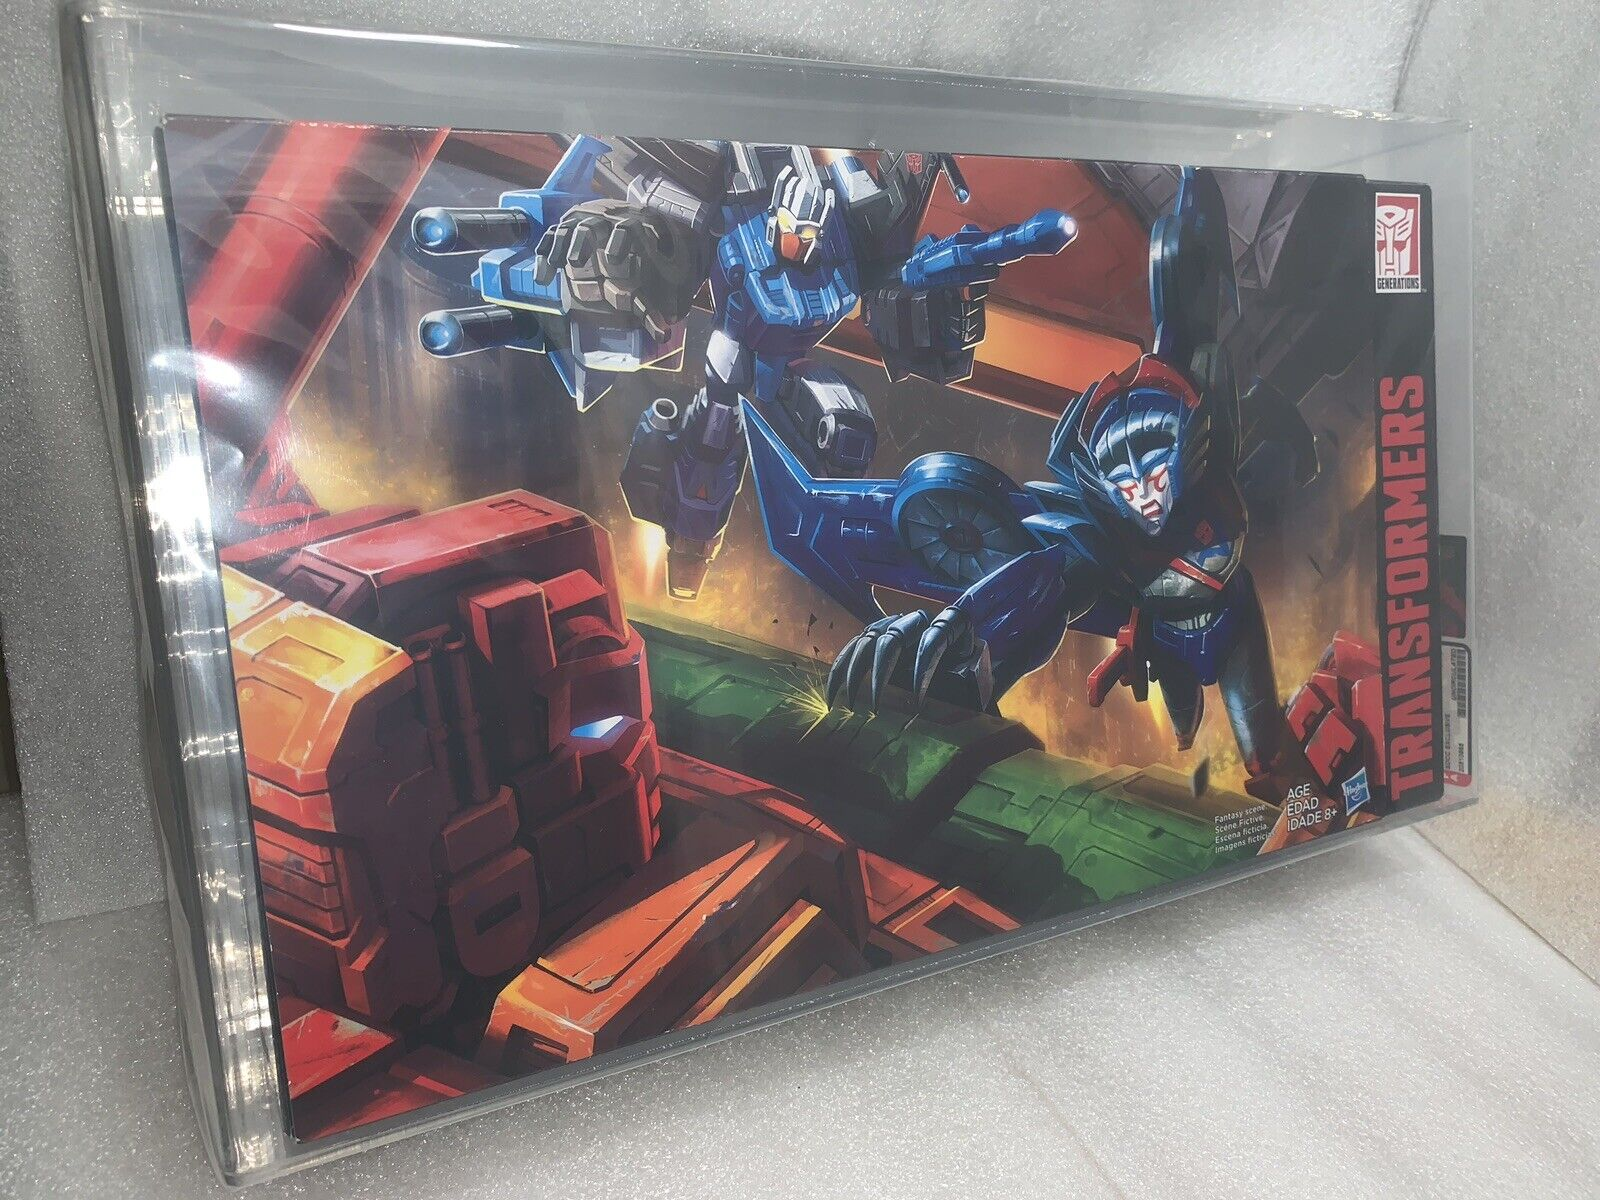 2016 SDCC Exclusive Transformers Titans Returns Titan Force AFA Graded U9.0